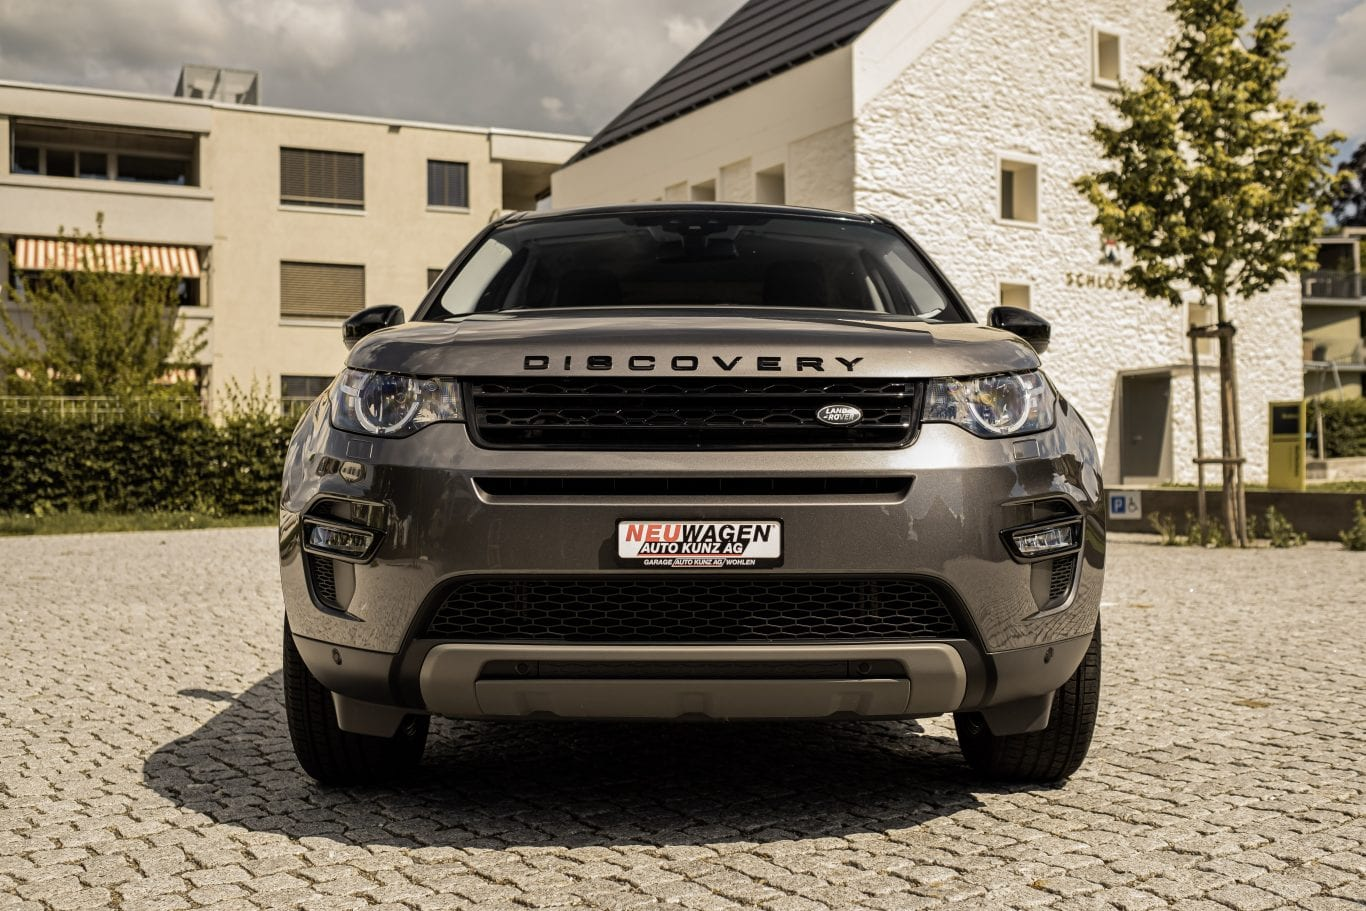 Sonderverkauf verlängert bis 06.08.2020 - Auto Kunz AG 63